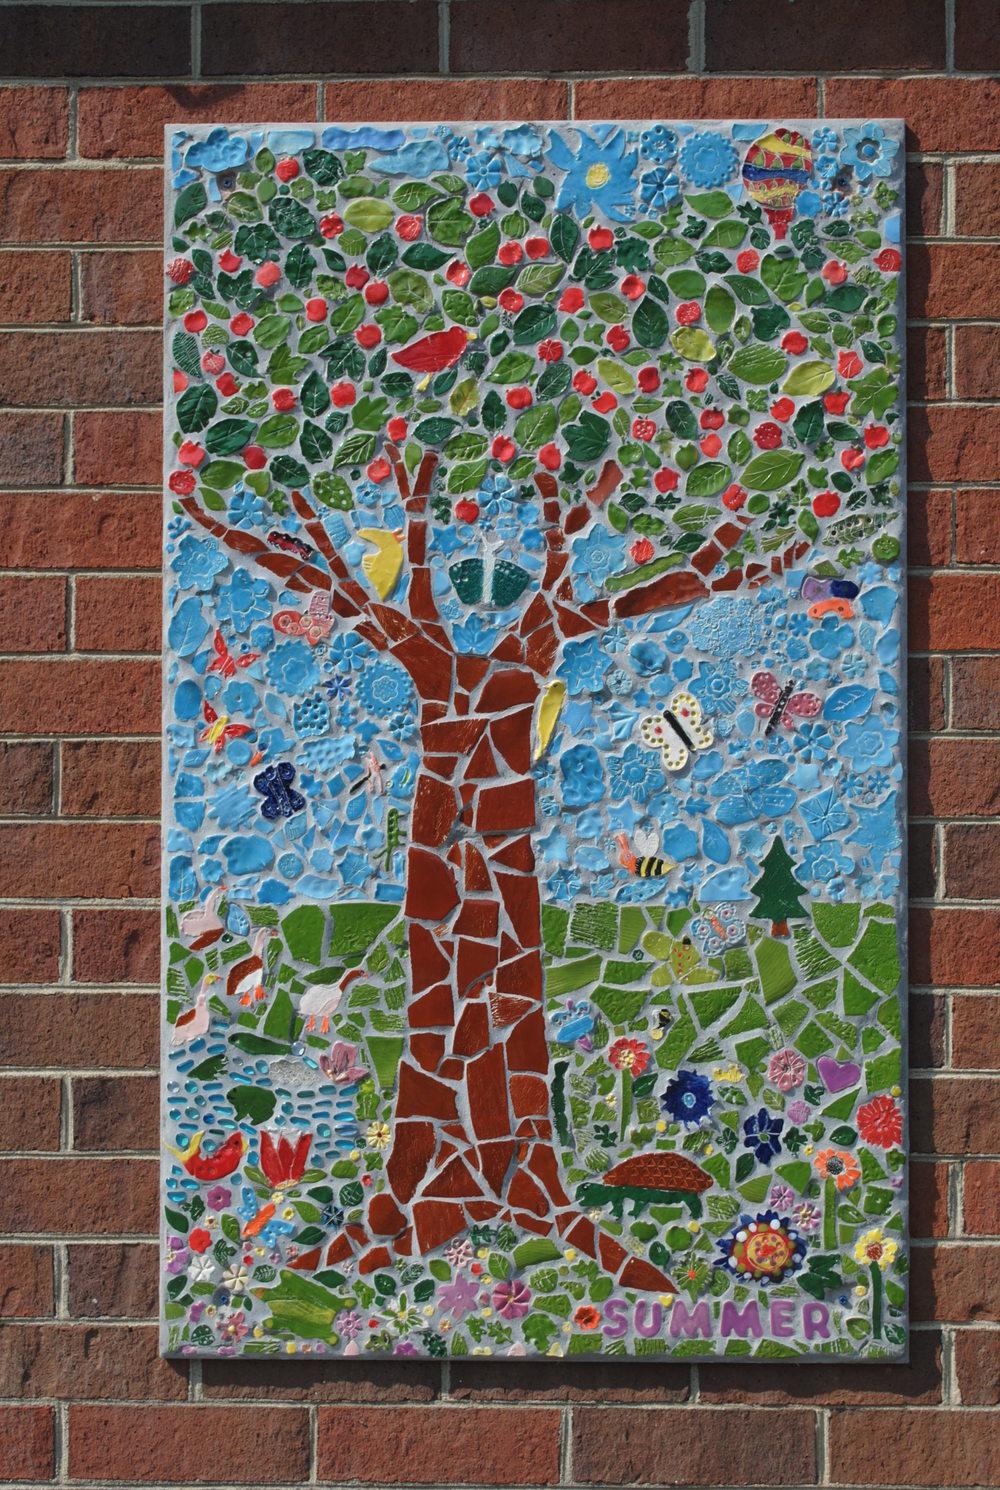 Summer mosaic panel